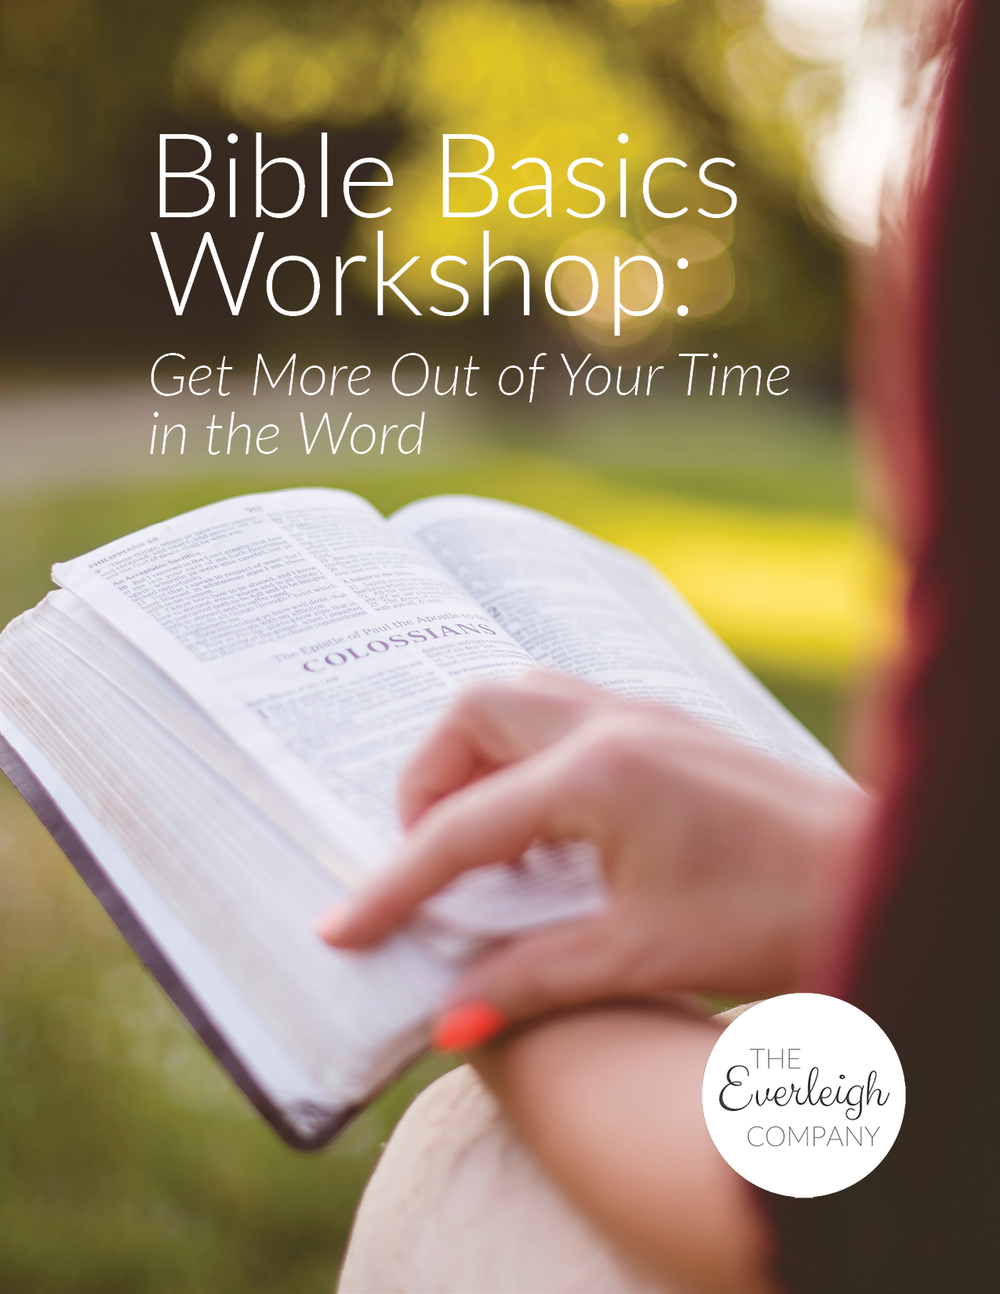 Bible Basics Workshop.png